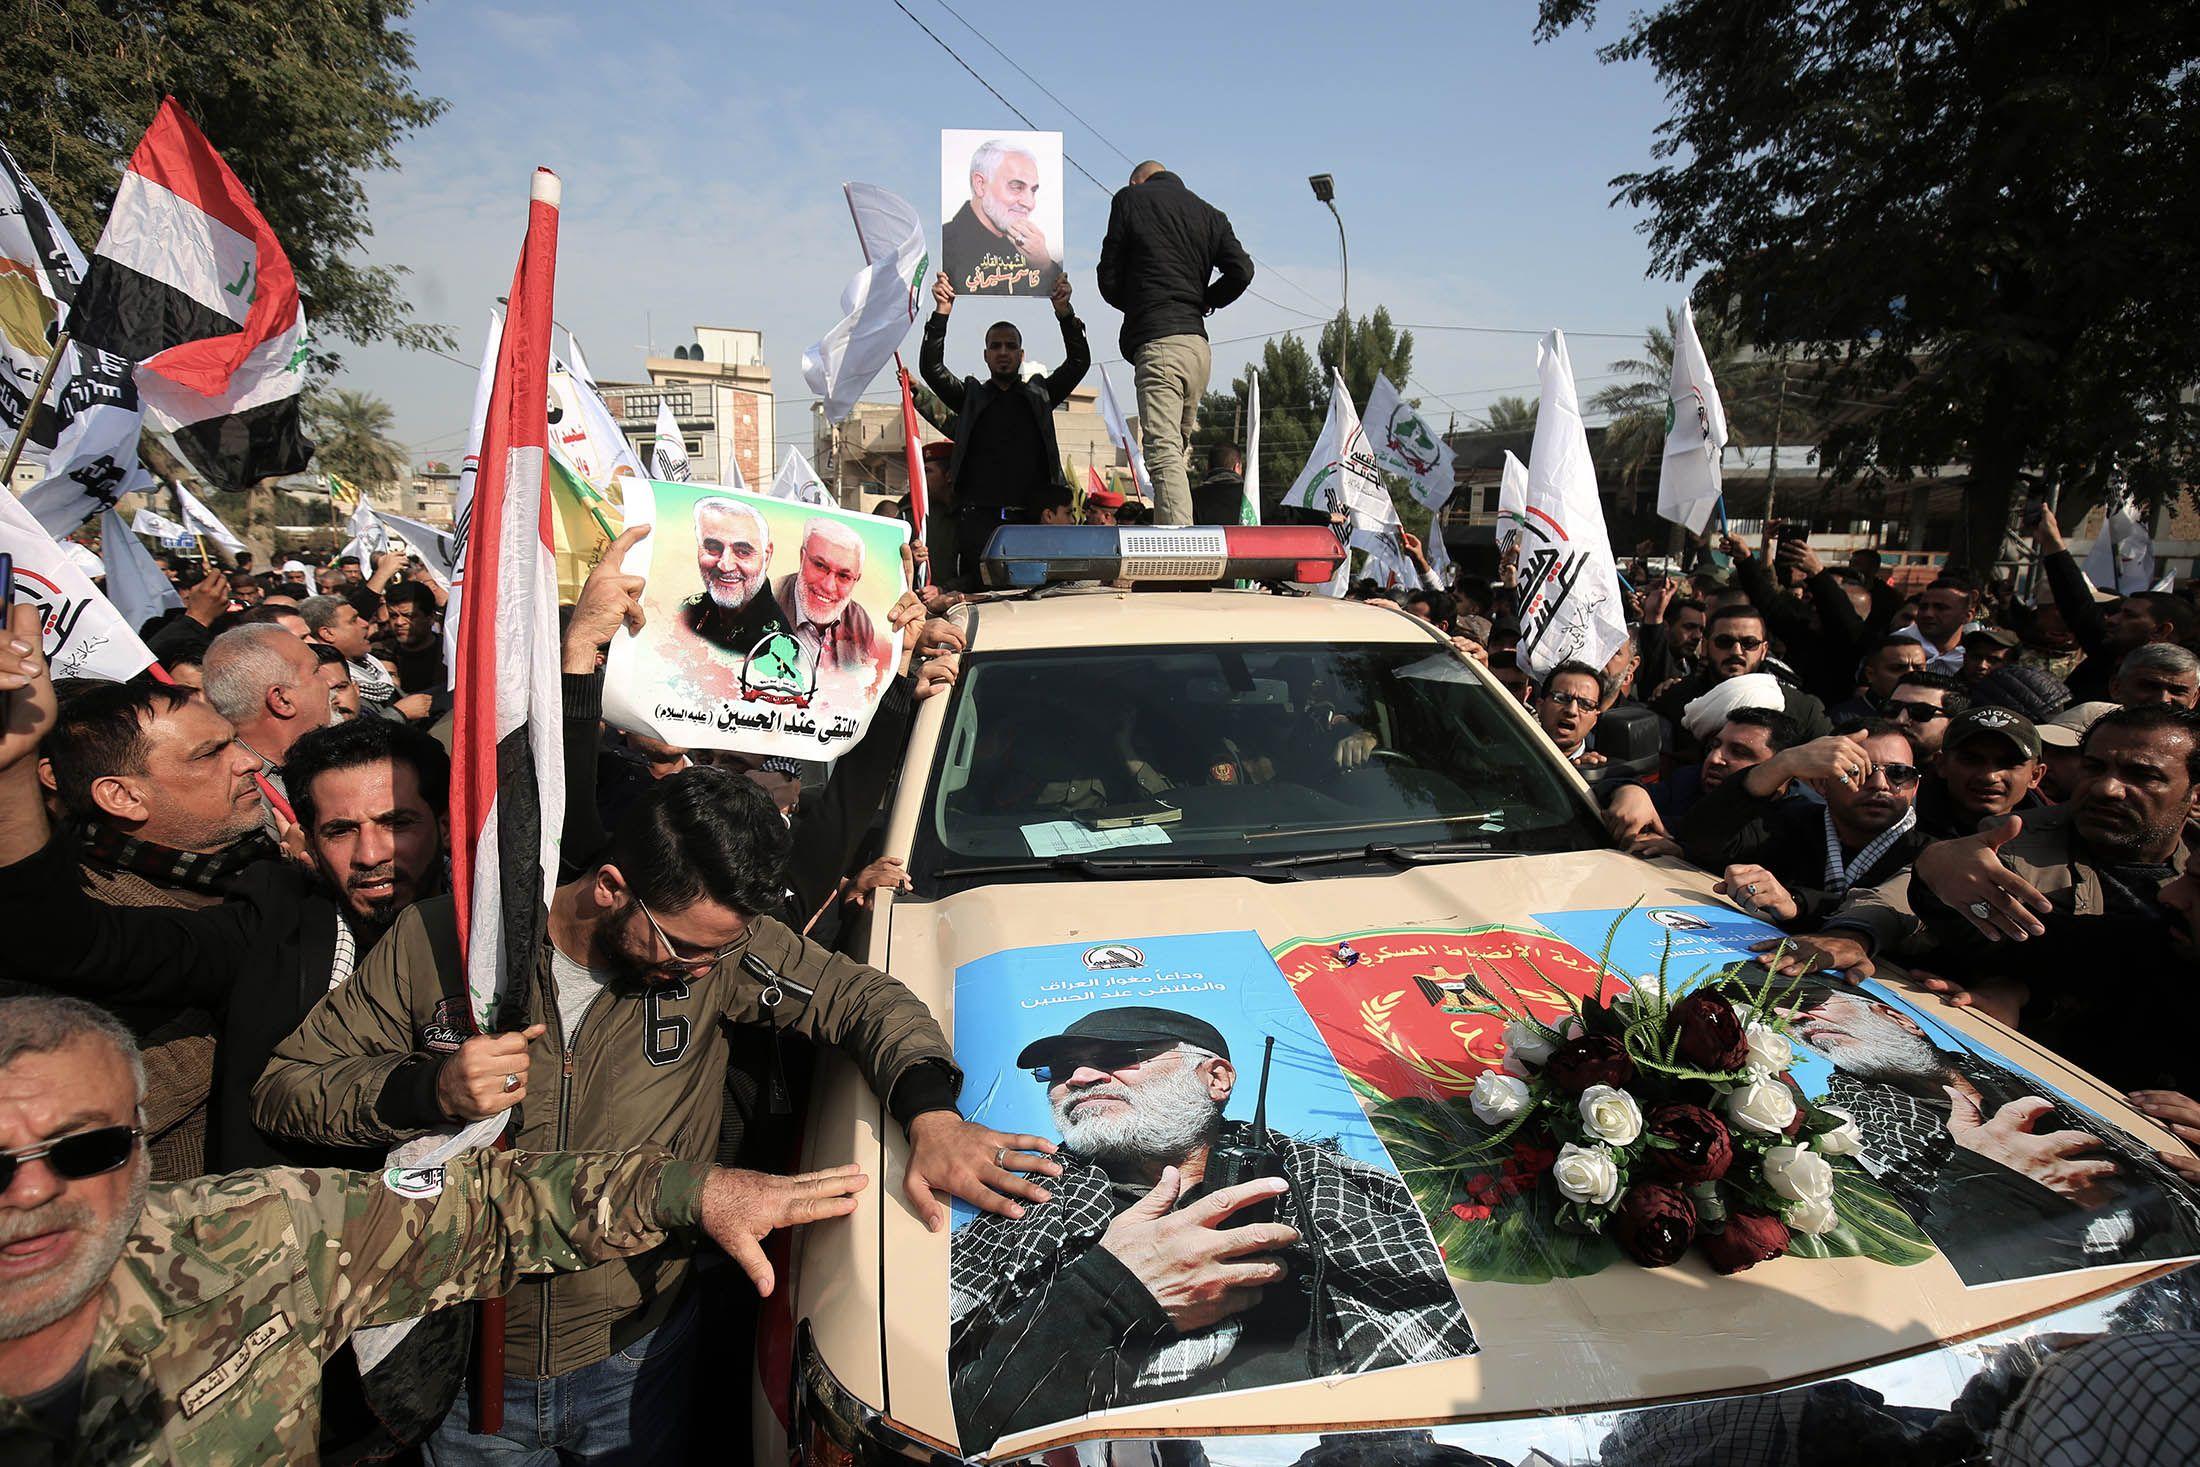 El grupo terrorista Hamás prometió vengar la muerte de Soleimani